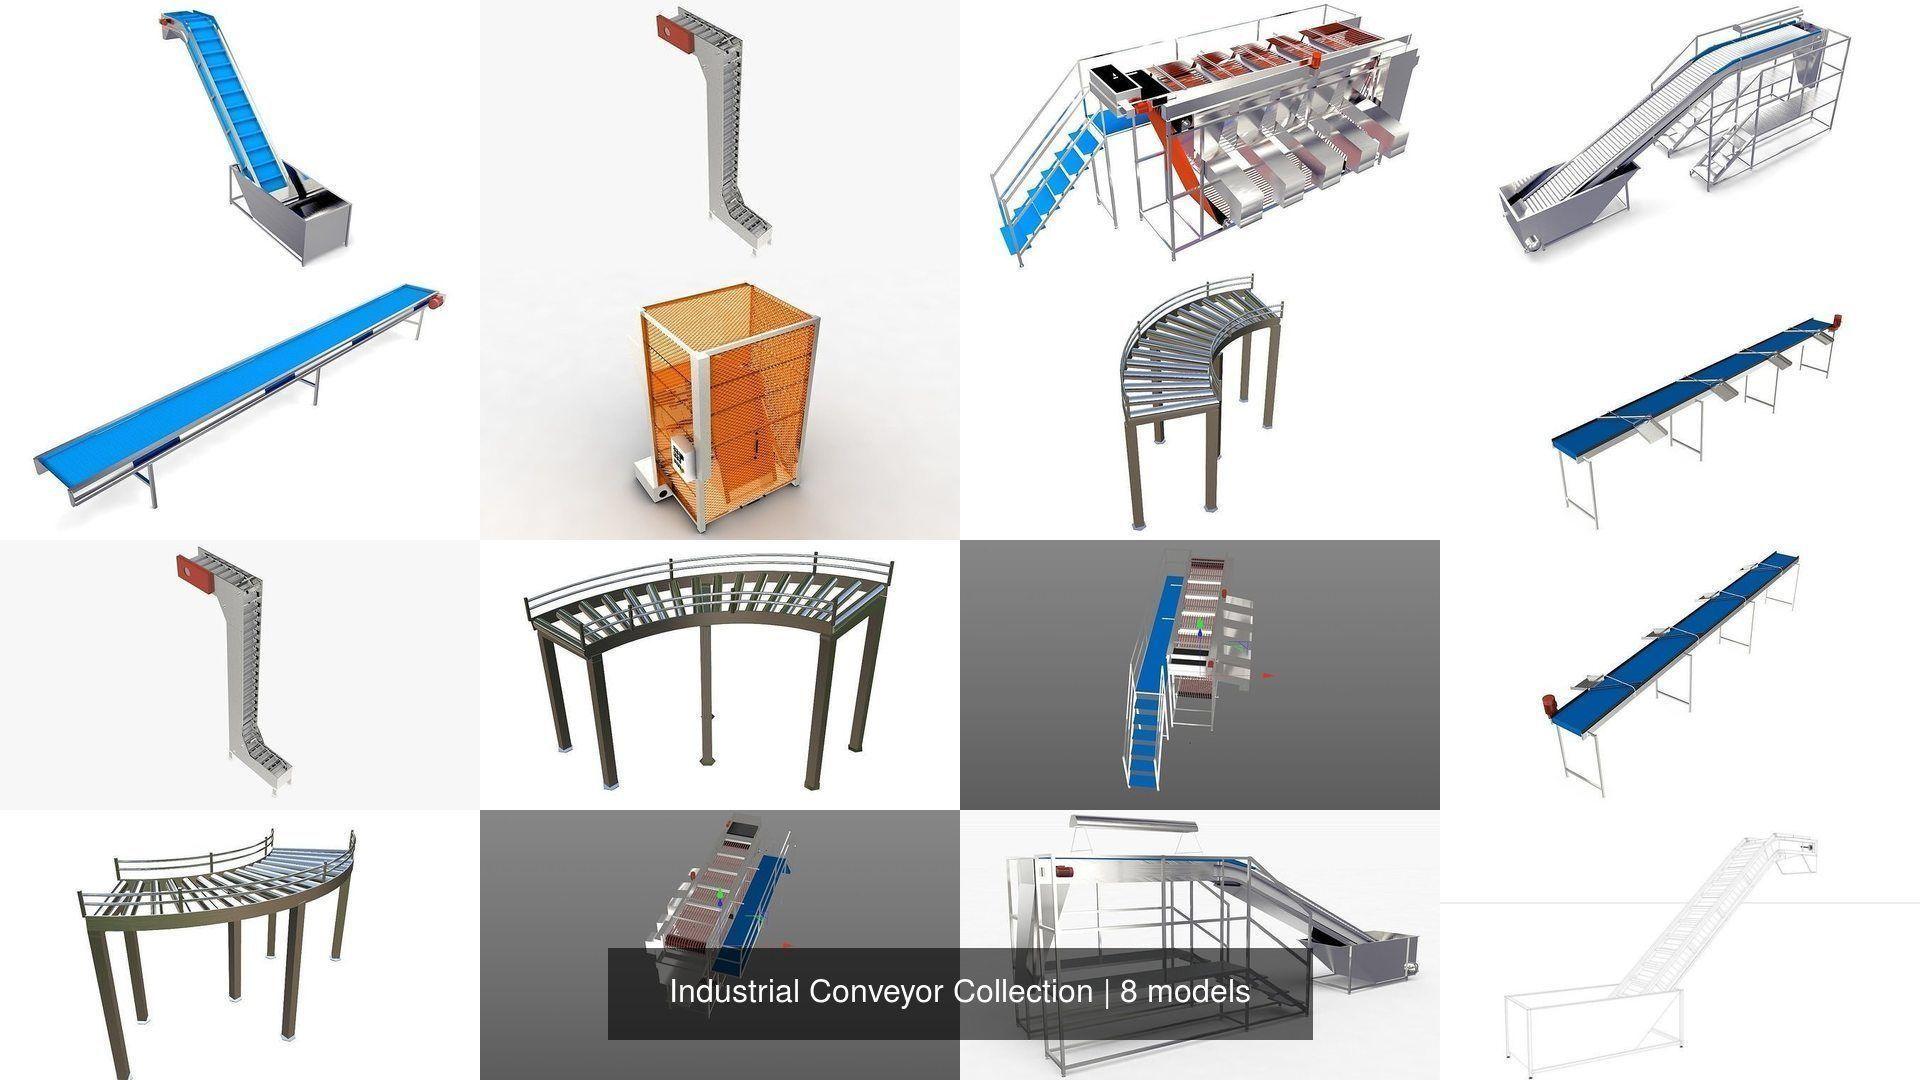 Industrial Conveyor Collection